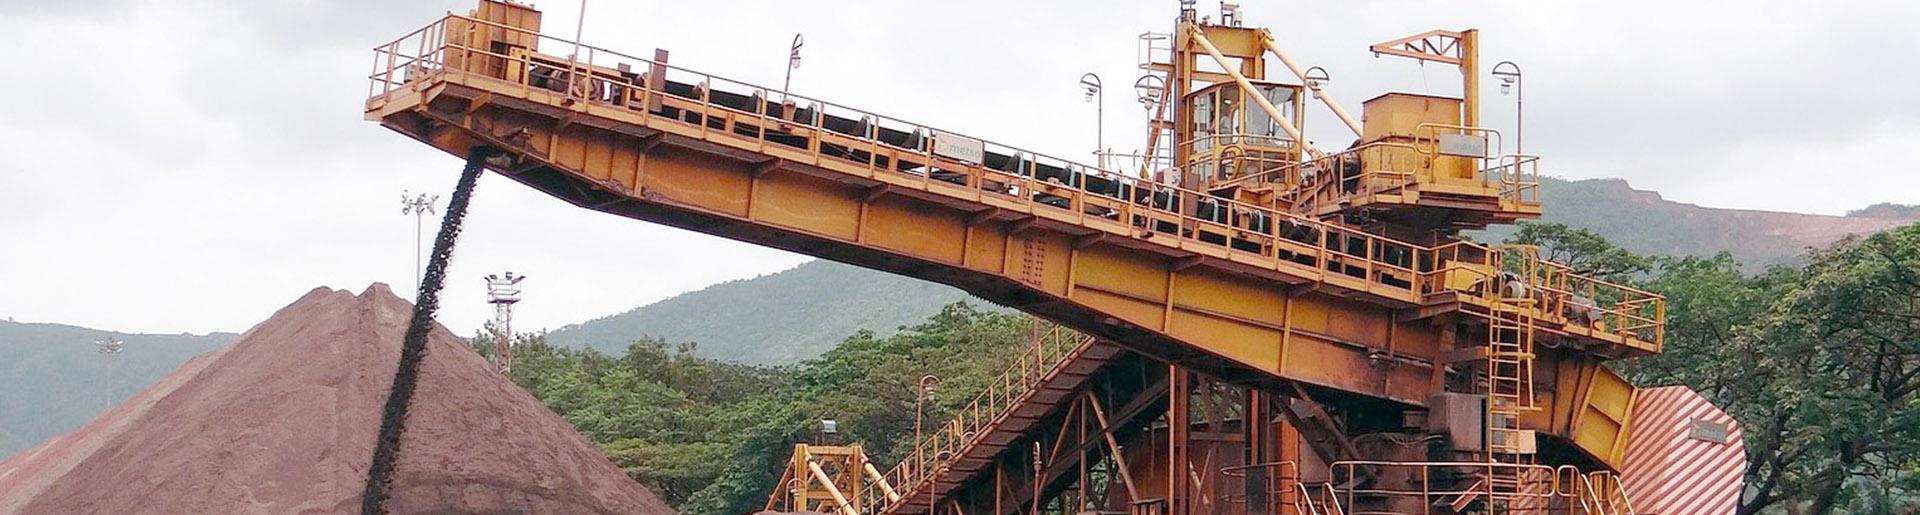 Iron ore supply chain banner